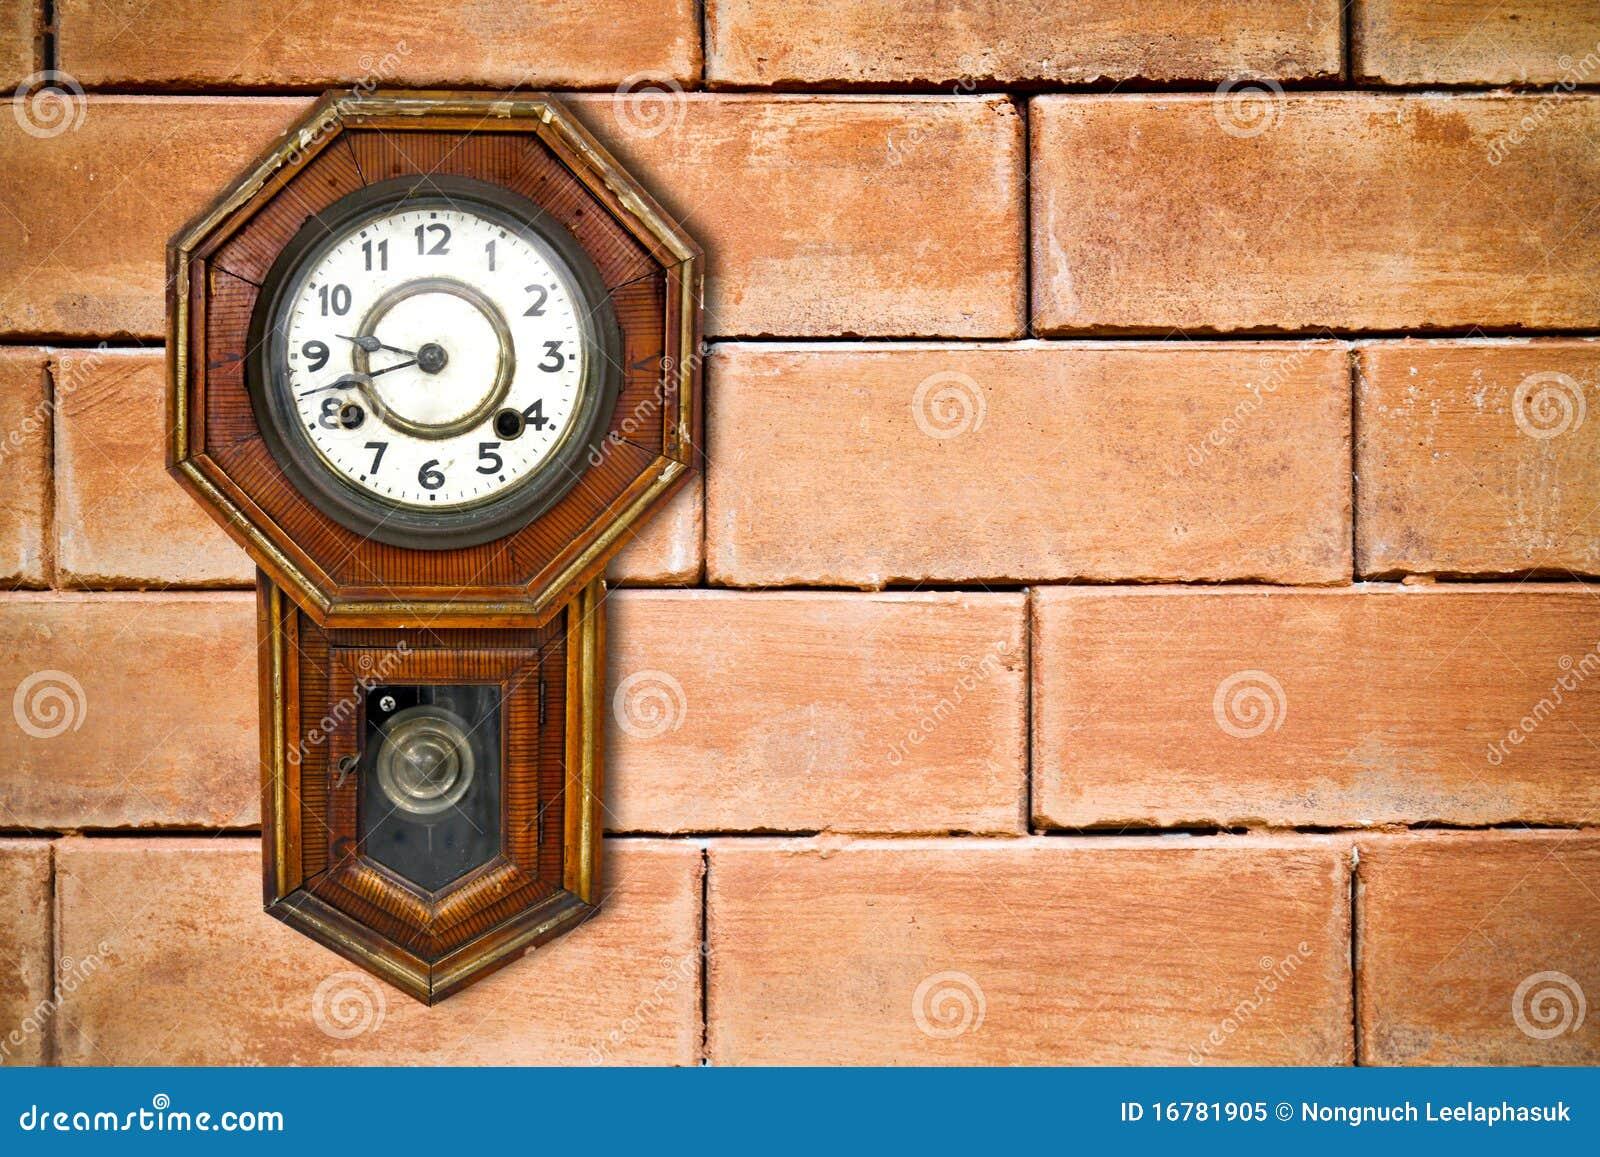 Retro Clock Hanging On Brick Wall Stock Image Image Of Background